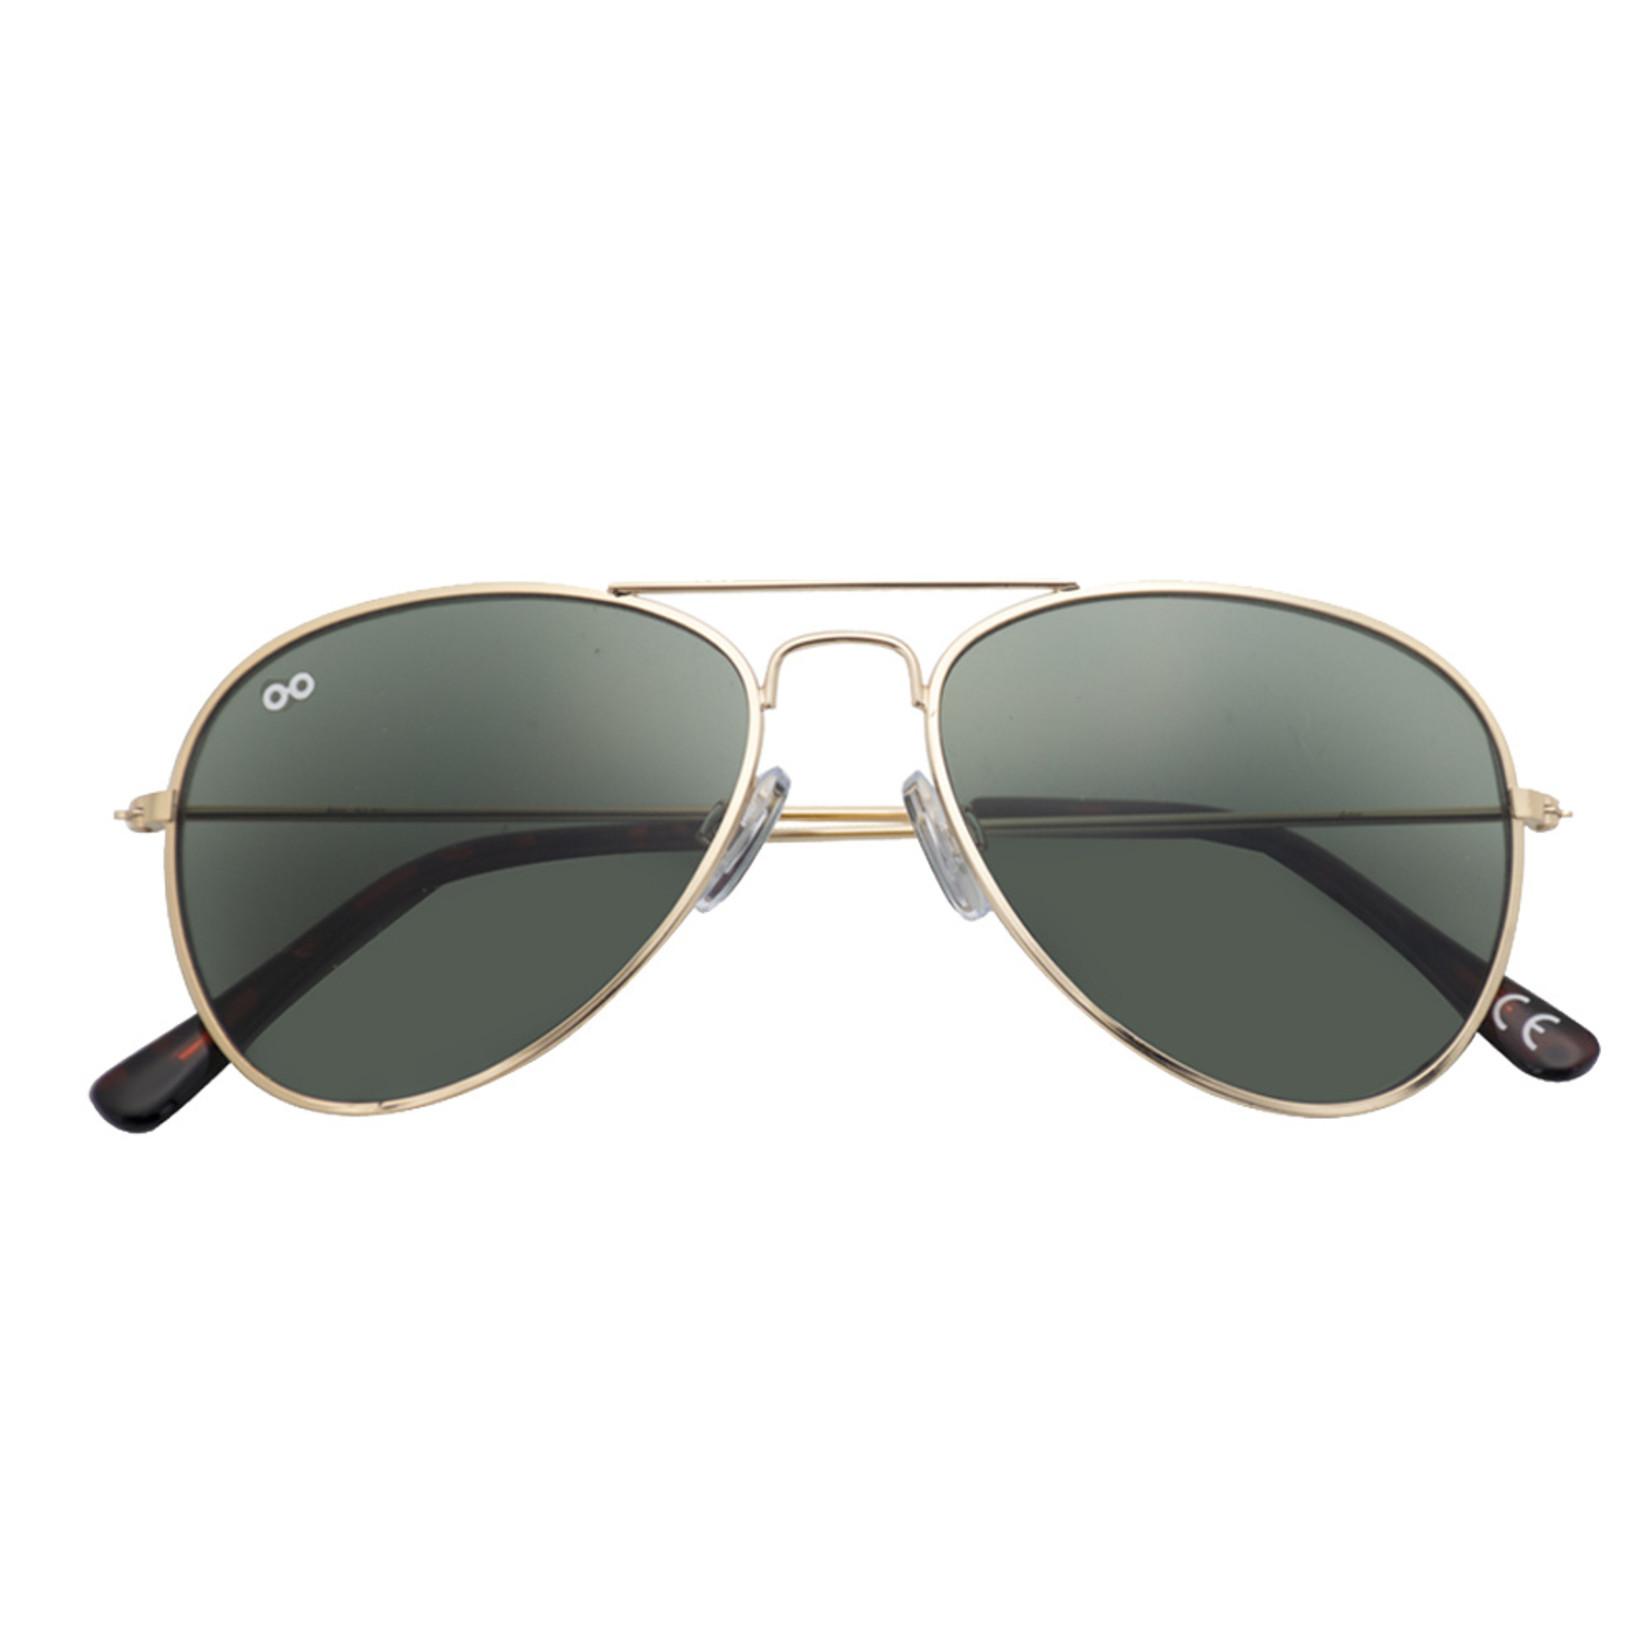 Croon Ann Satin Gold Lees & Zon leesbril zonnebril pilotenbril